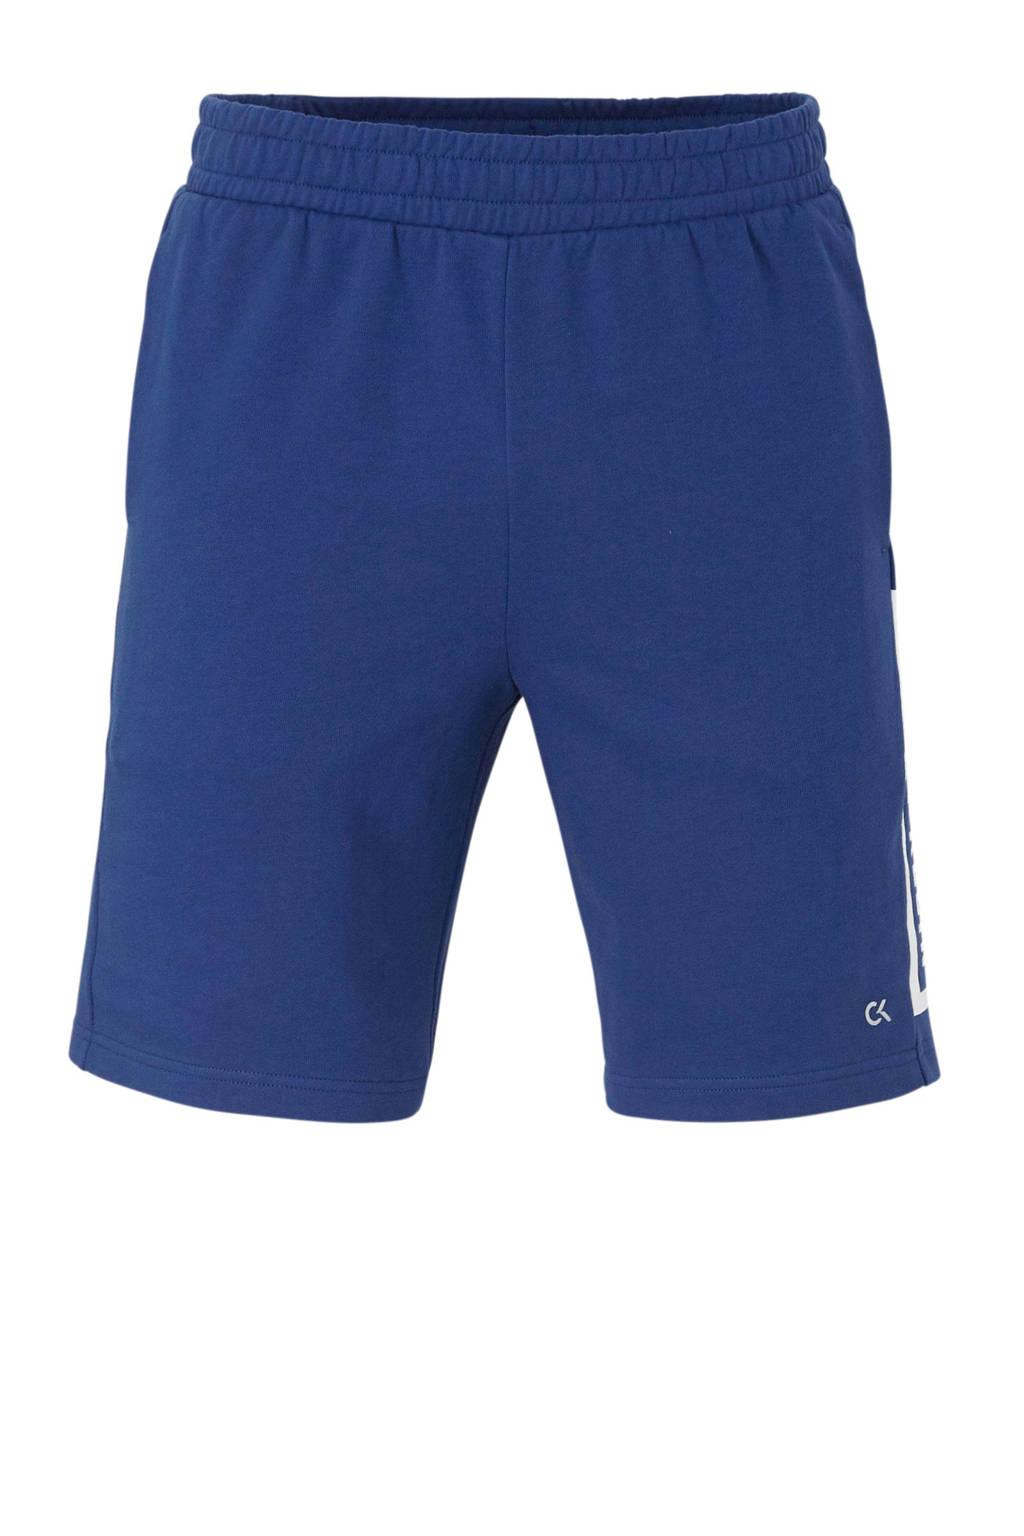 Calvin Klein   sportshort met printopdruk blauw, Blauw